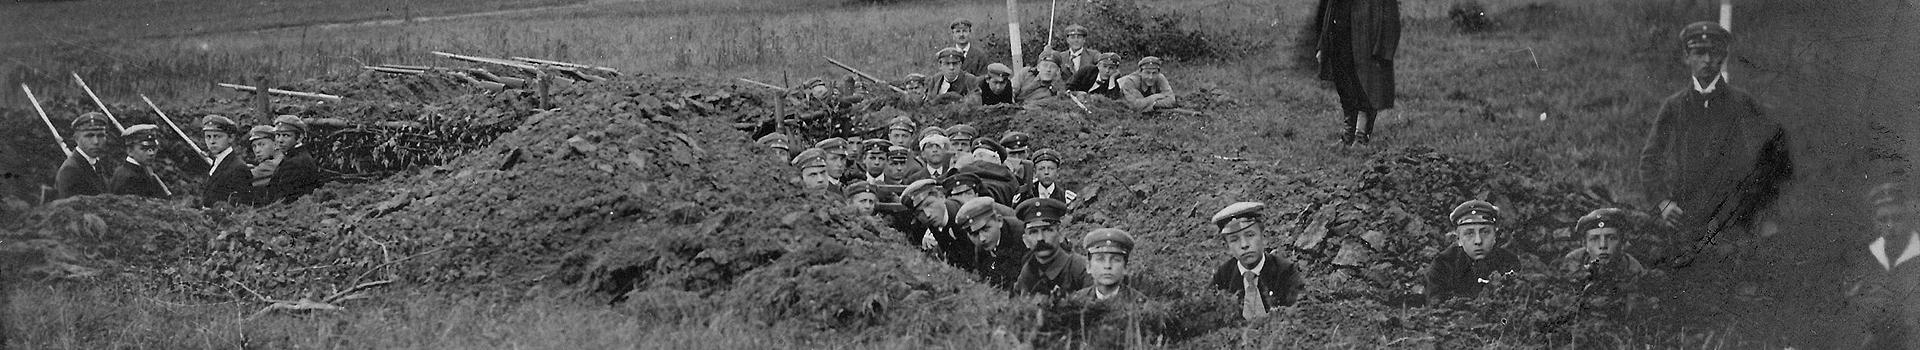 Kriegsbeginn 1914 in Oberkassel